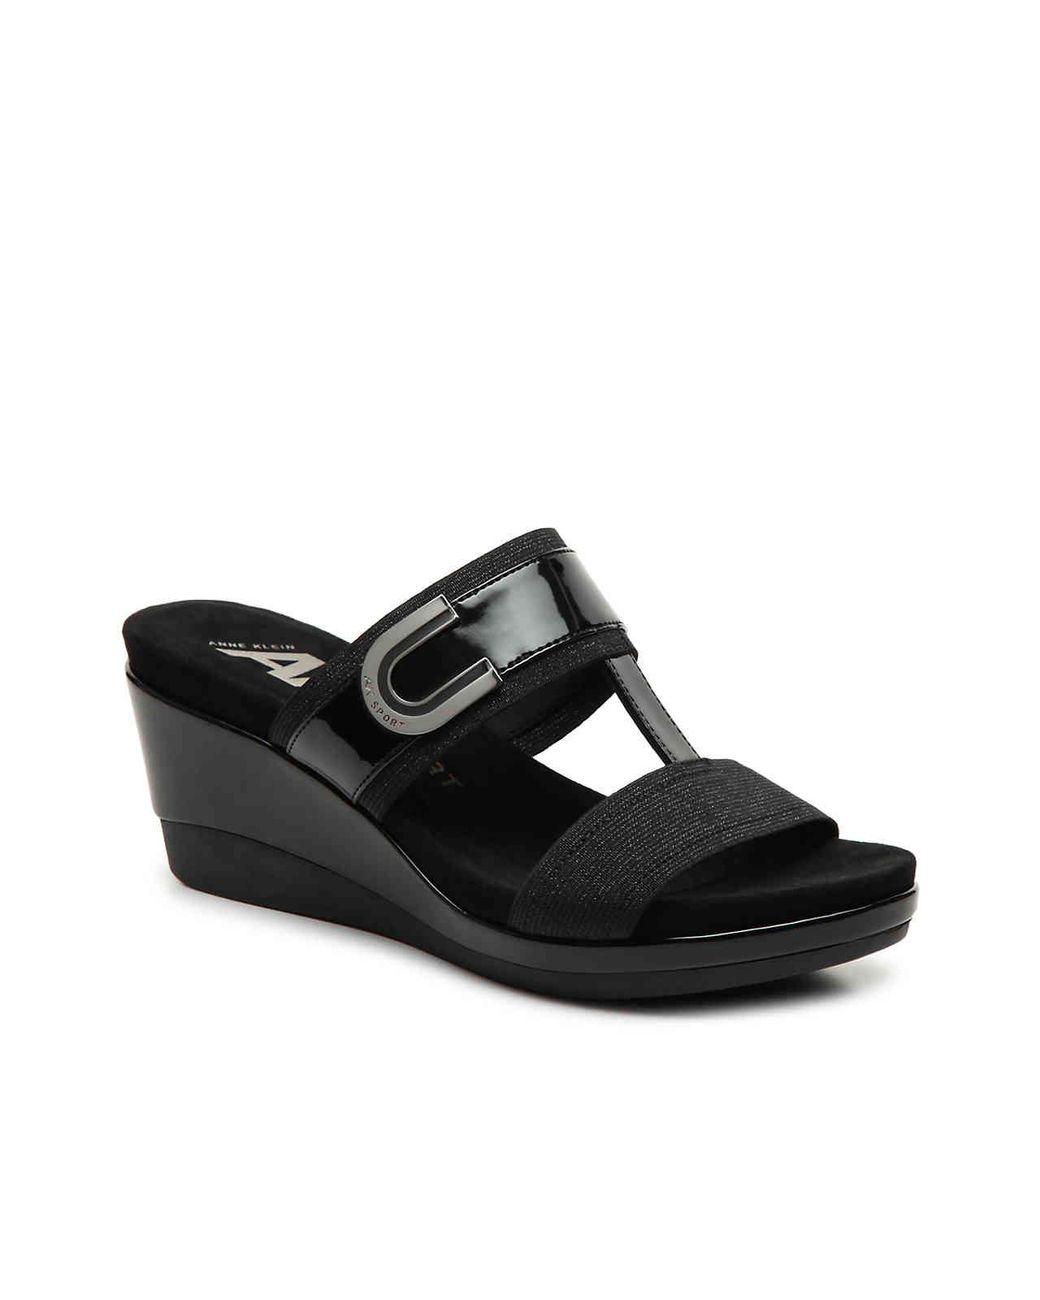 106e88c54fdd Lyst - Anne Klein Sport Pax Wedge Sandal in Black